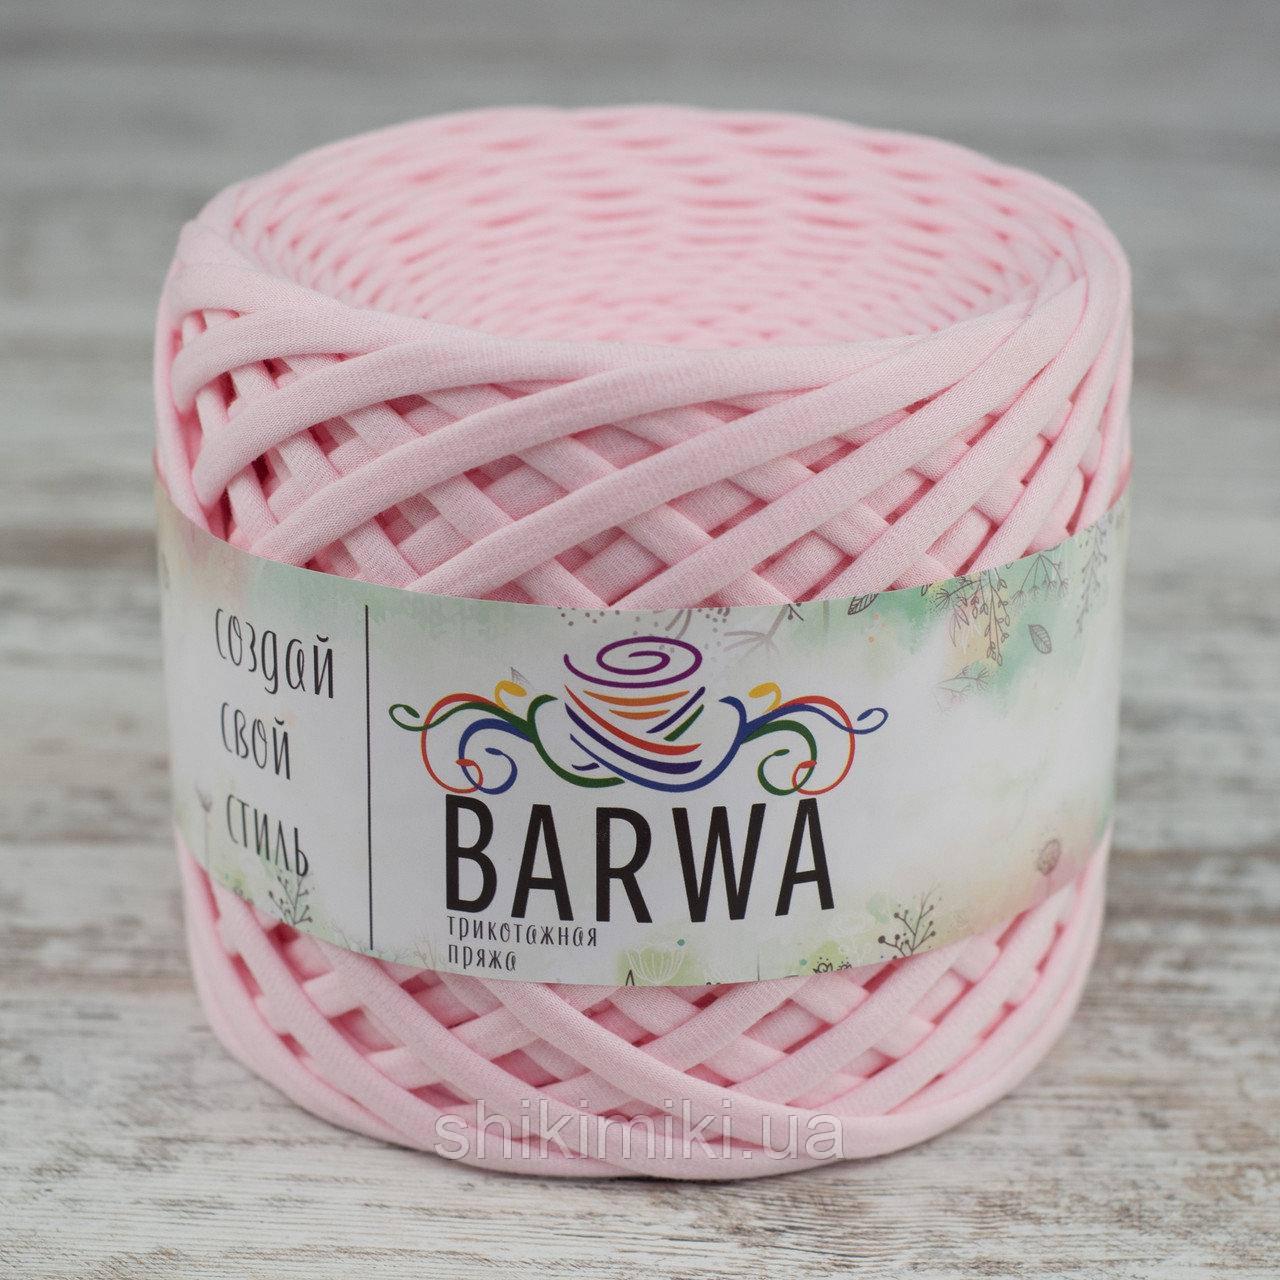 Трикотажная пряжа Barwa (7-9 мм), цвет Зефир